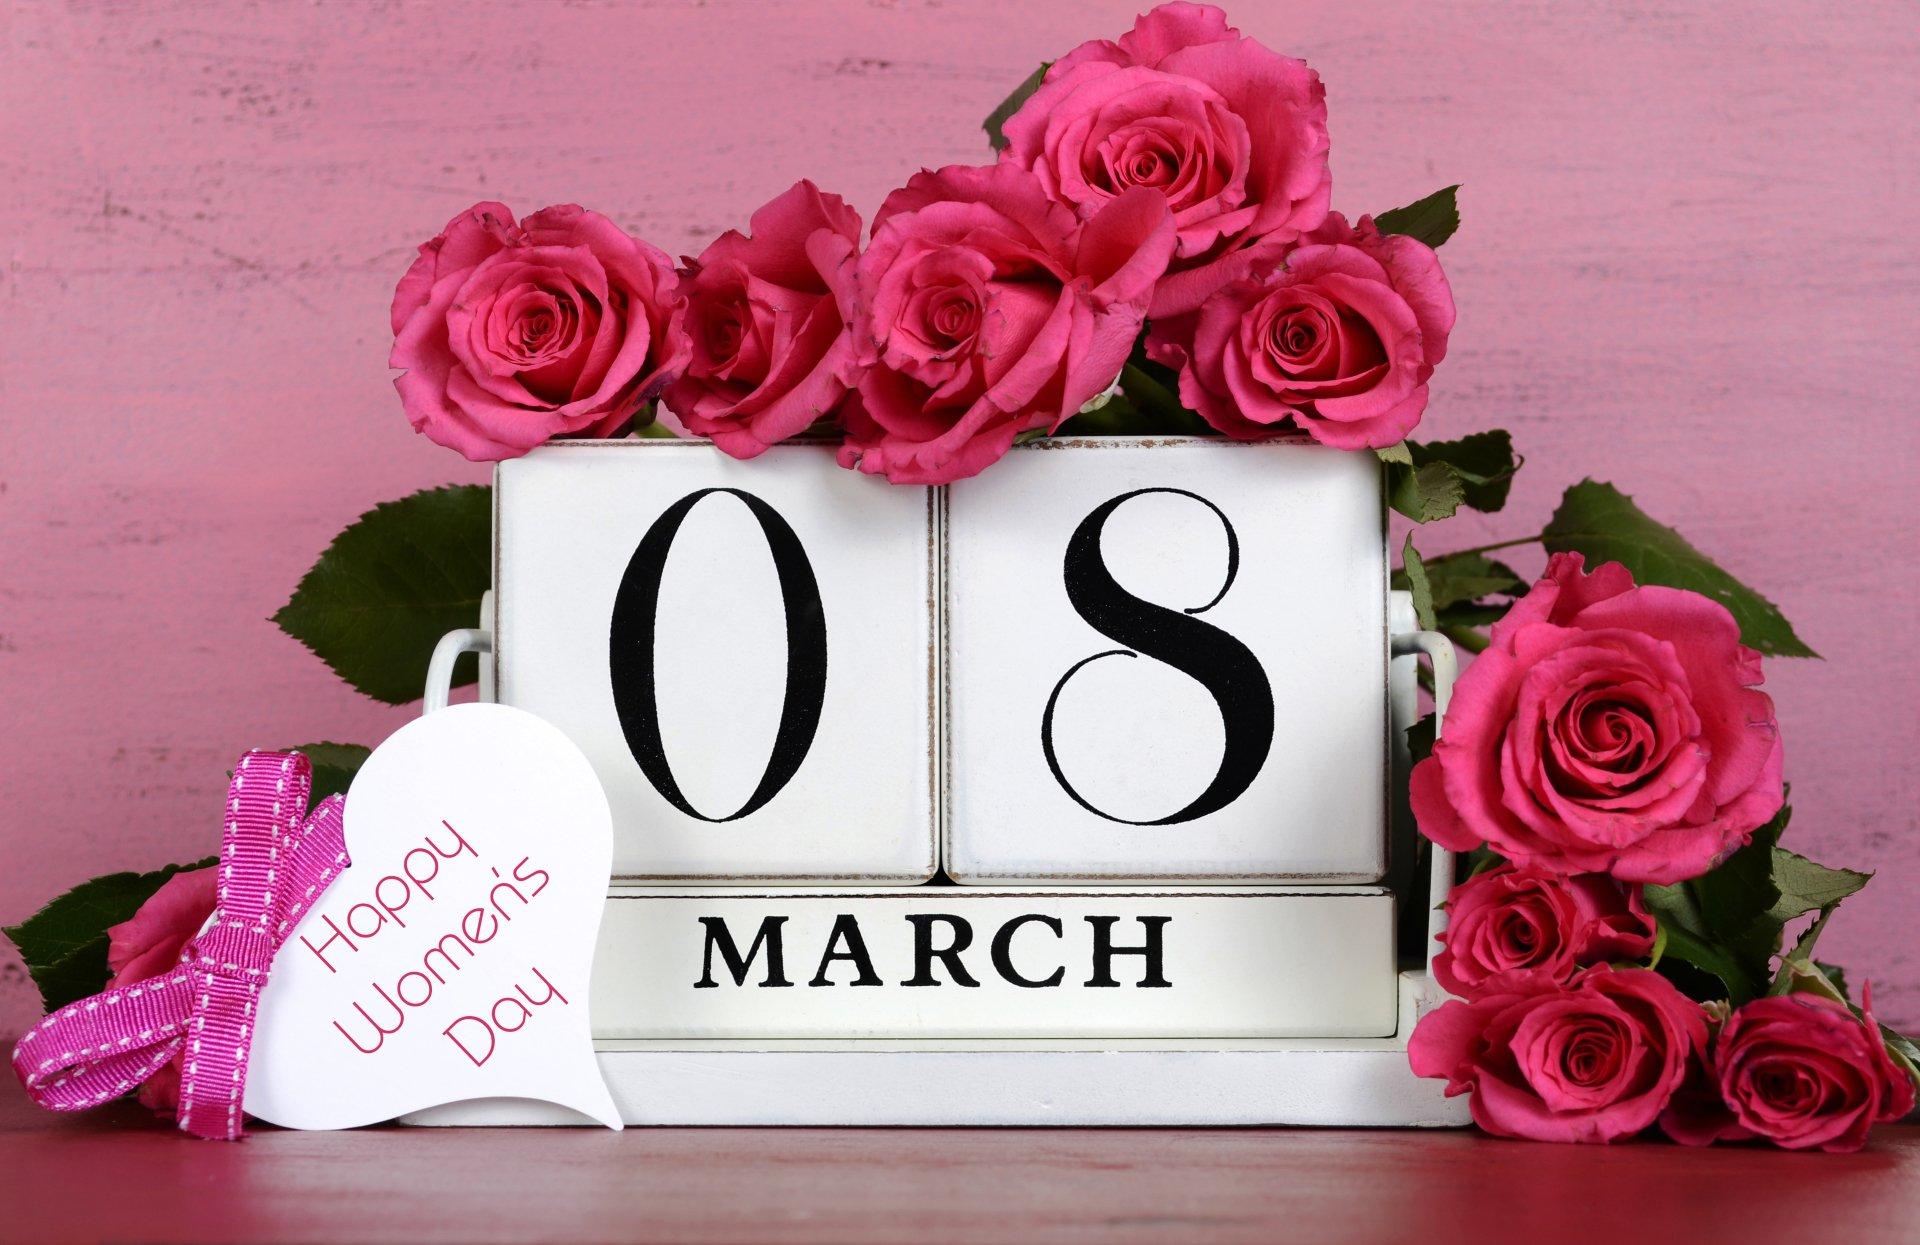 Vacances - Women's Day  Fleur Rose Pink Flower Fond d'écran